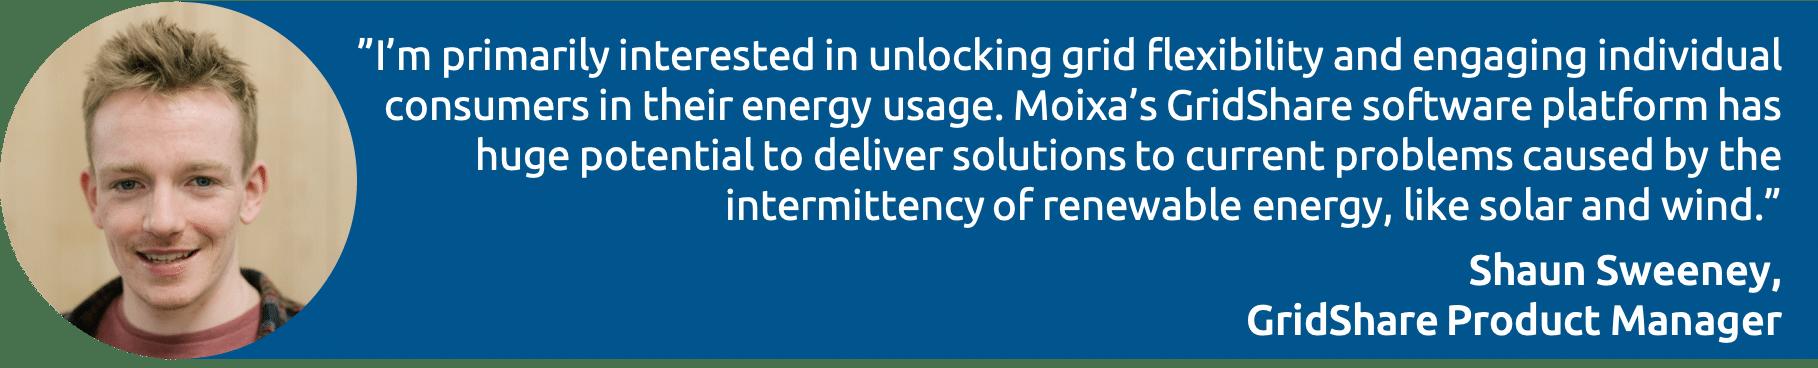 Shaun quote image Moixa   Home Energy Storage   Smart Energy Management